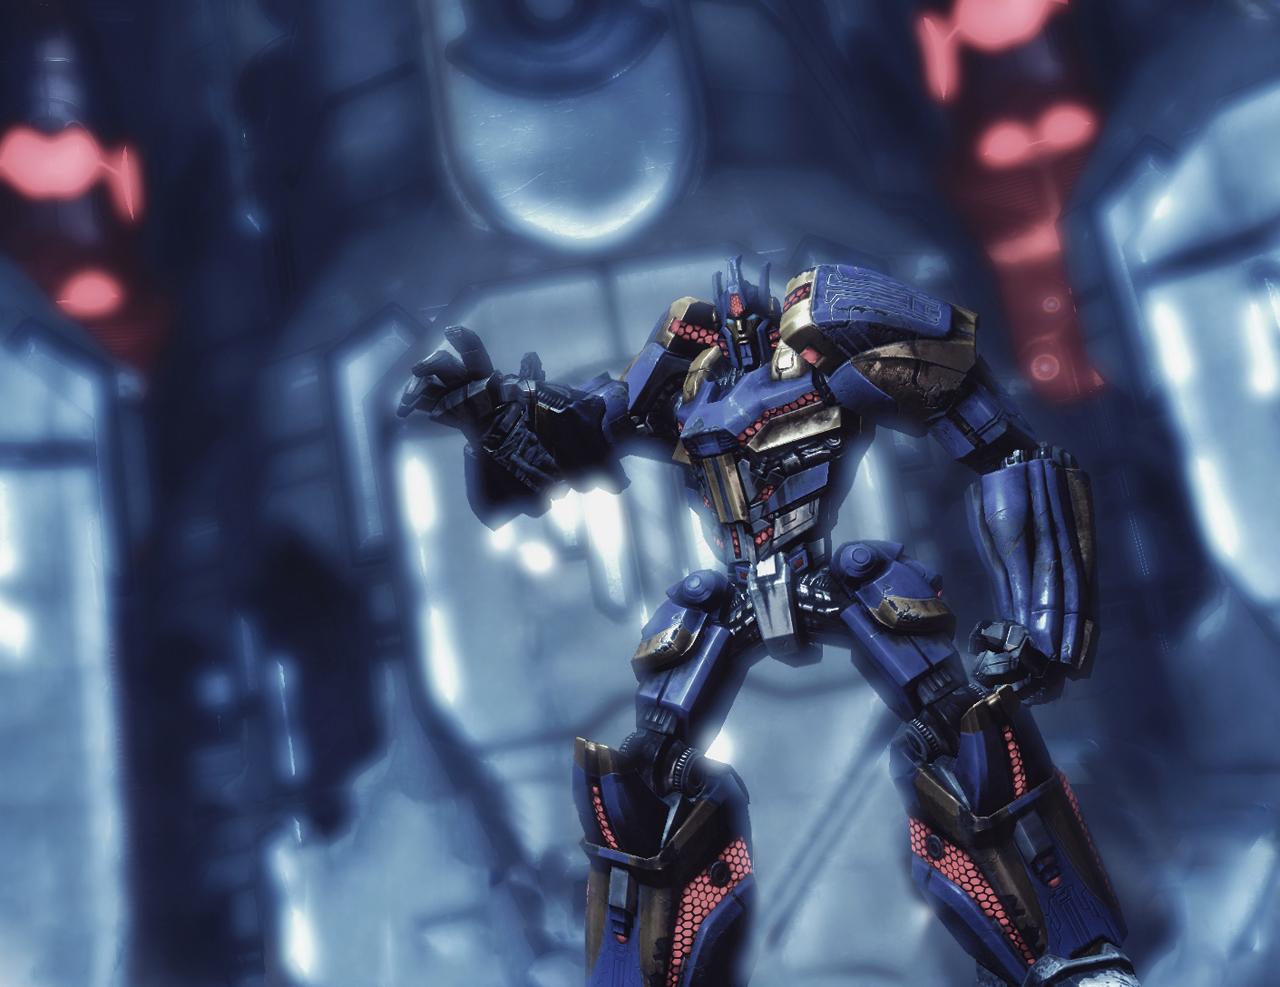 Zeta Prime g1 Zeta Prime And All His Fans